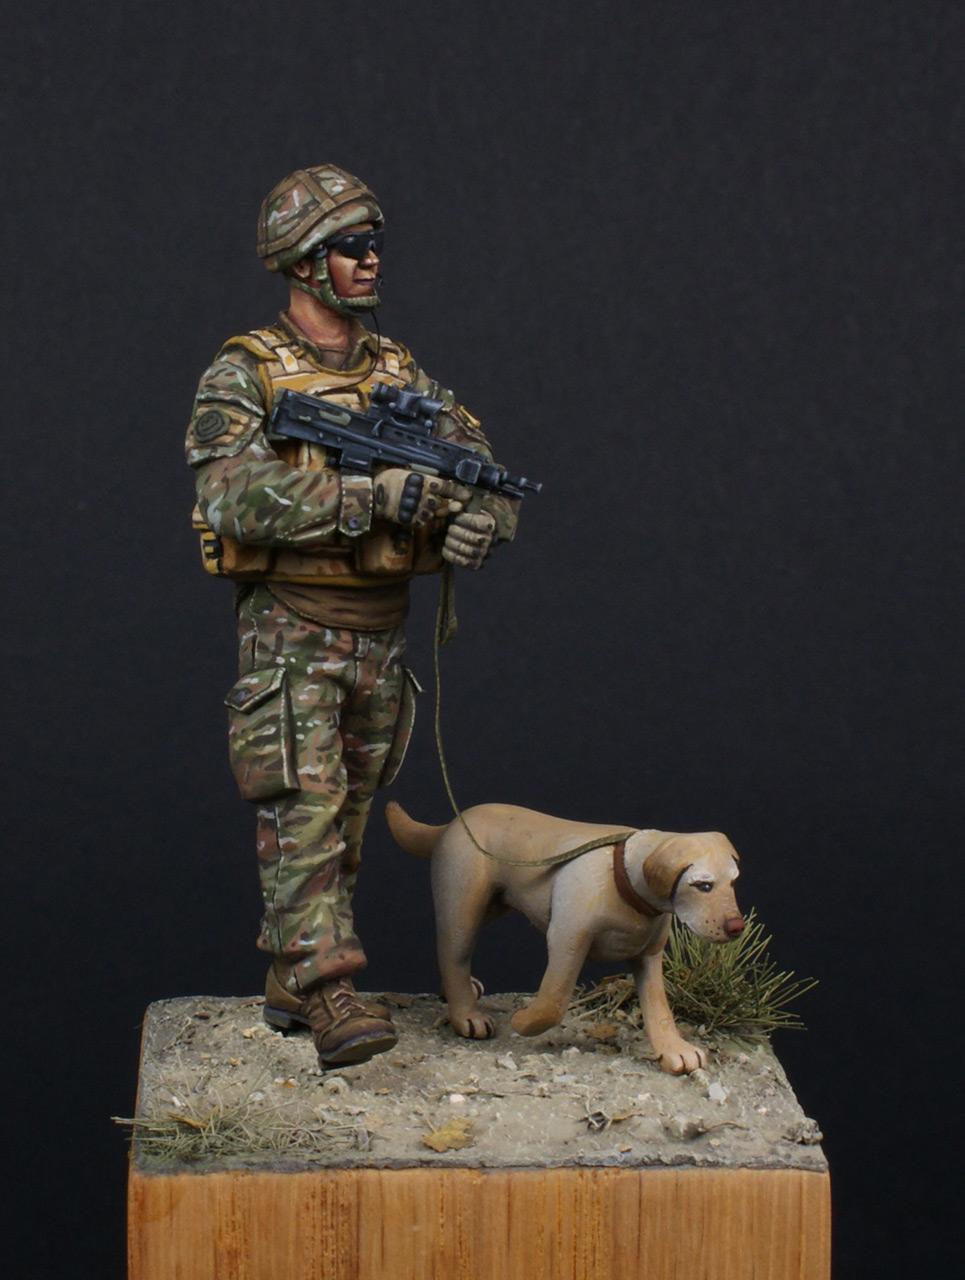 Figures: Patrol in Helmand, photo #2